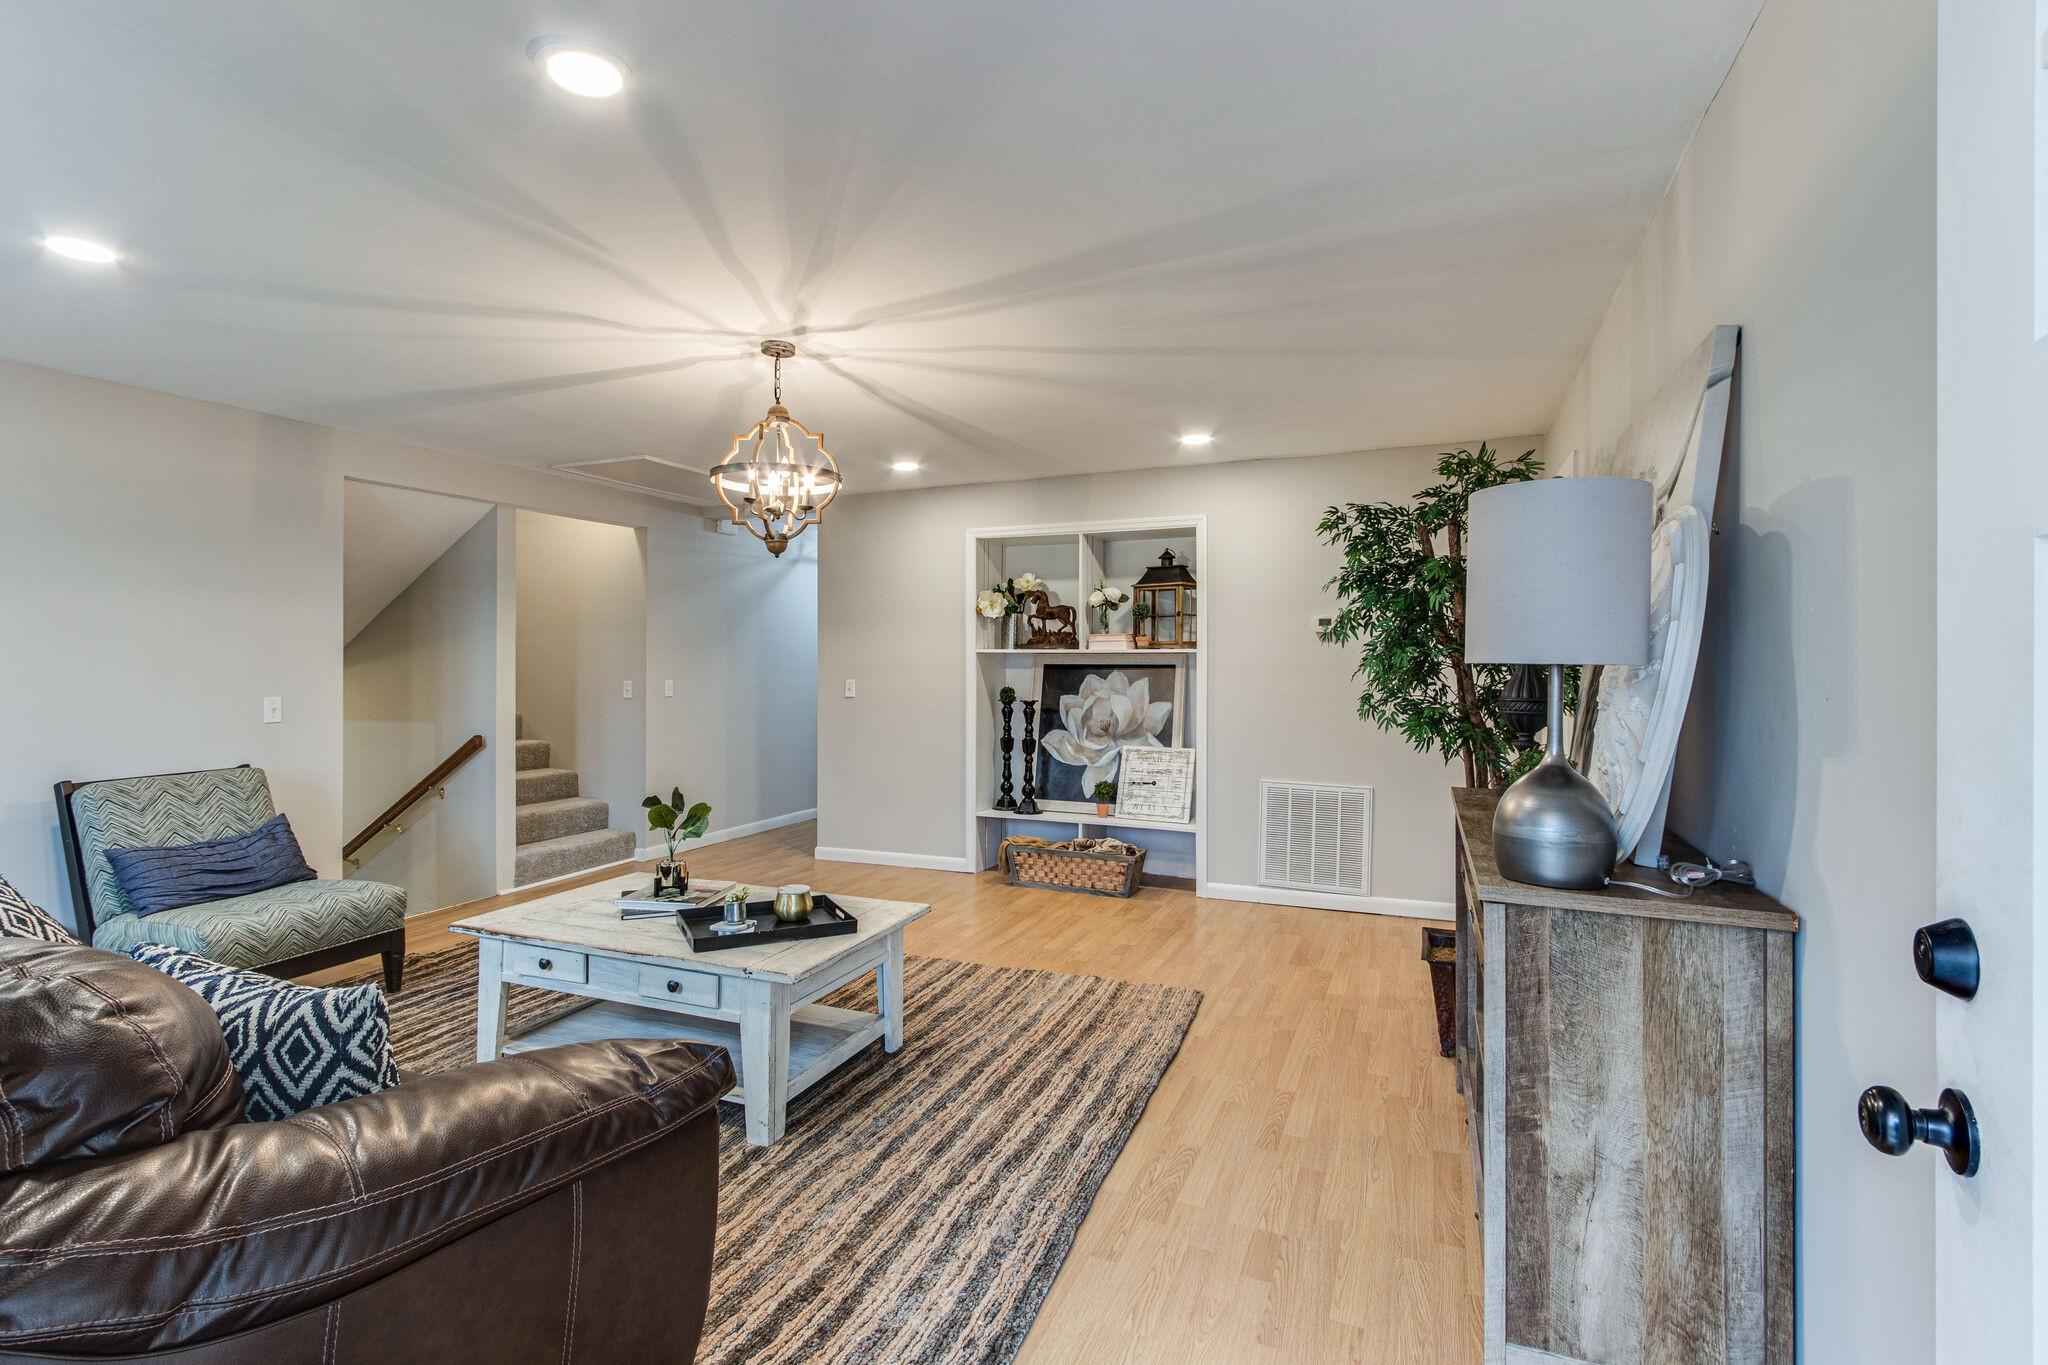 11651 SR 56 Property Photo - Coalmont, TN real estate listing